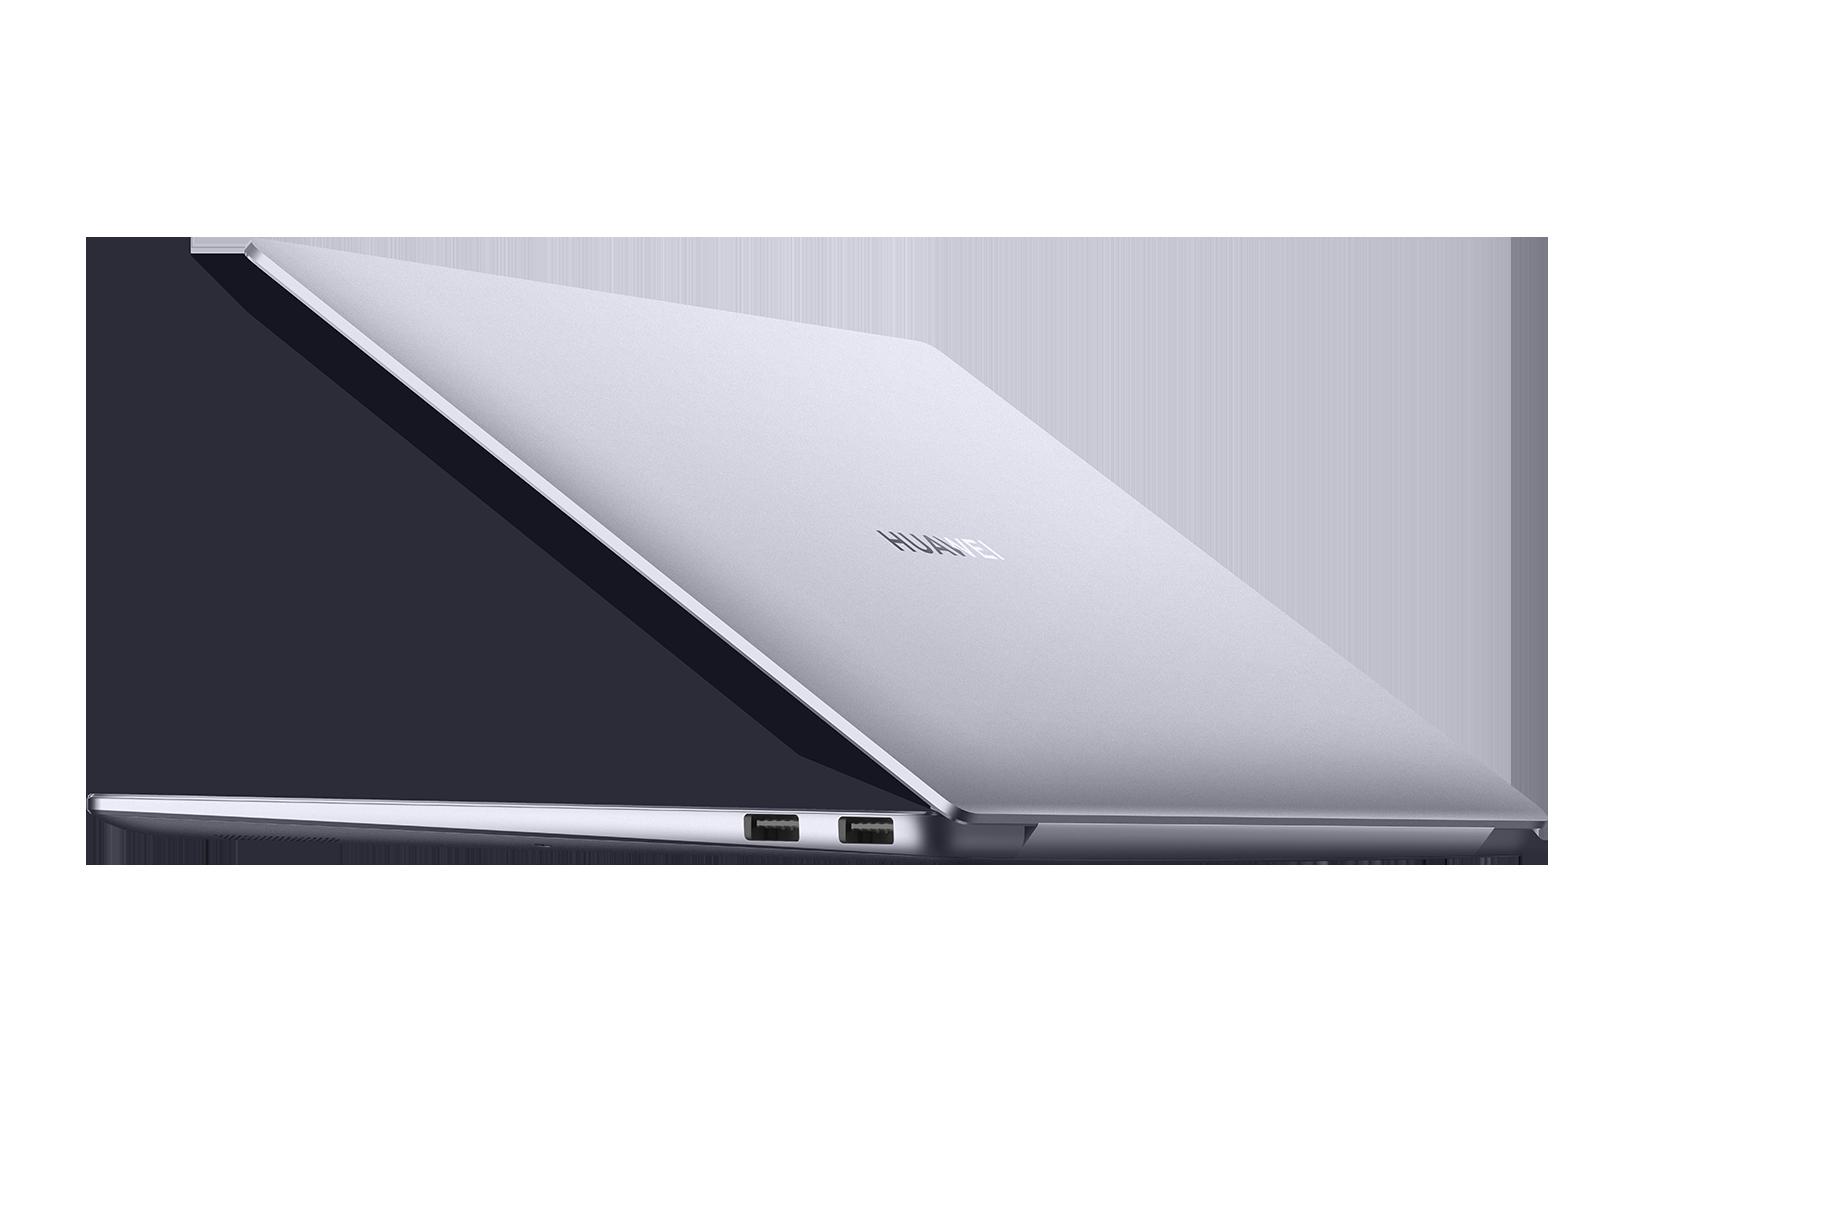 The New Huawei MateBook 14